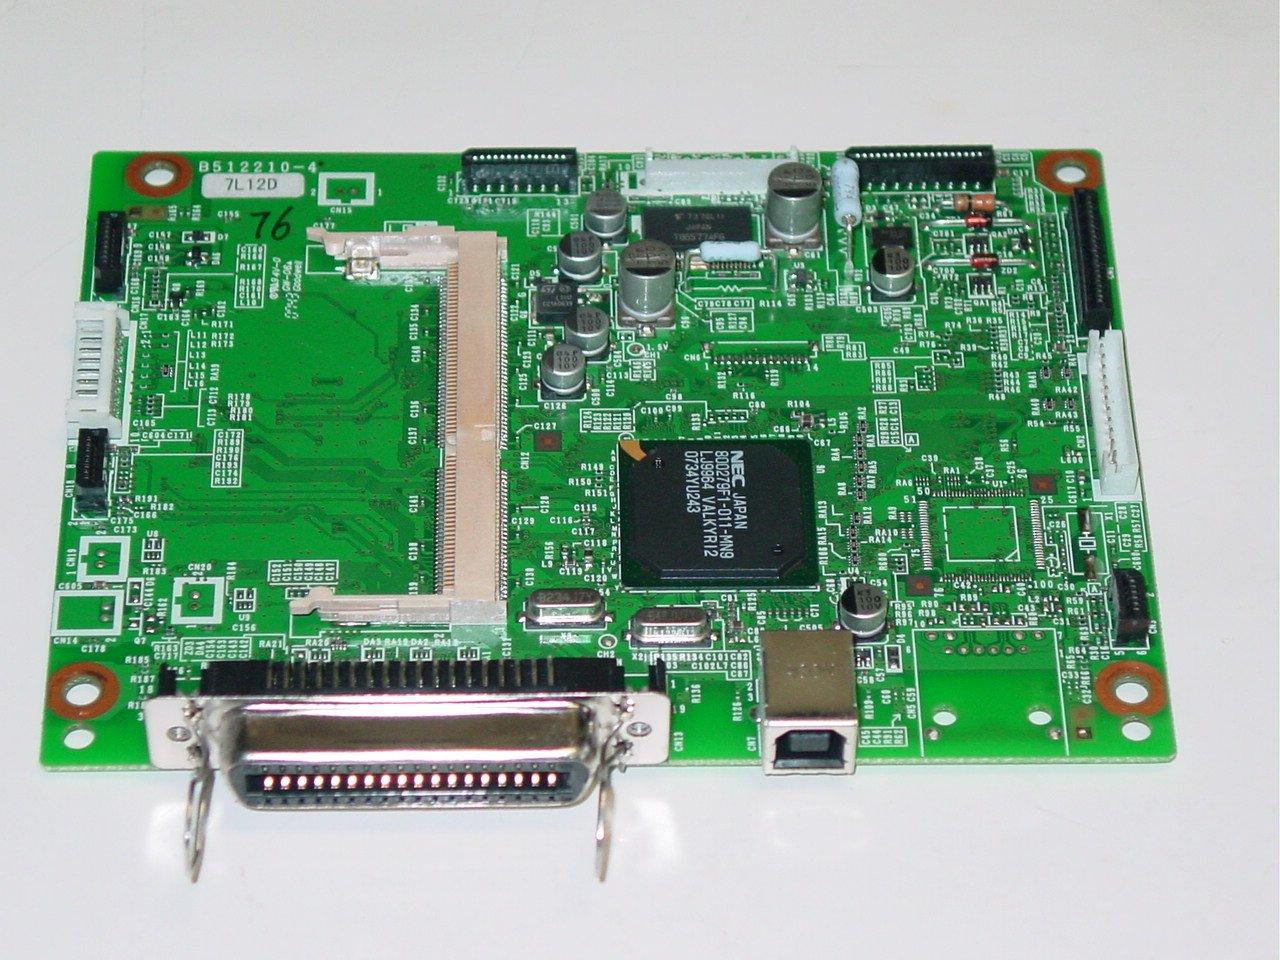 Brother HL-5240 Printer Formatter Main Board B512210-4 7L12D